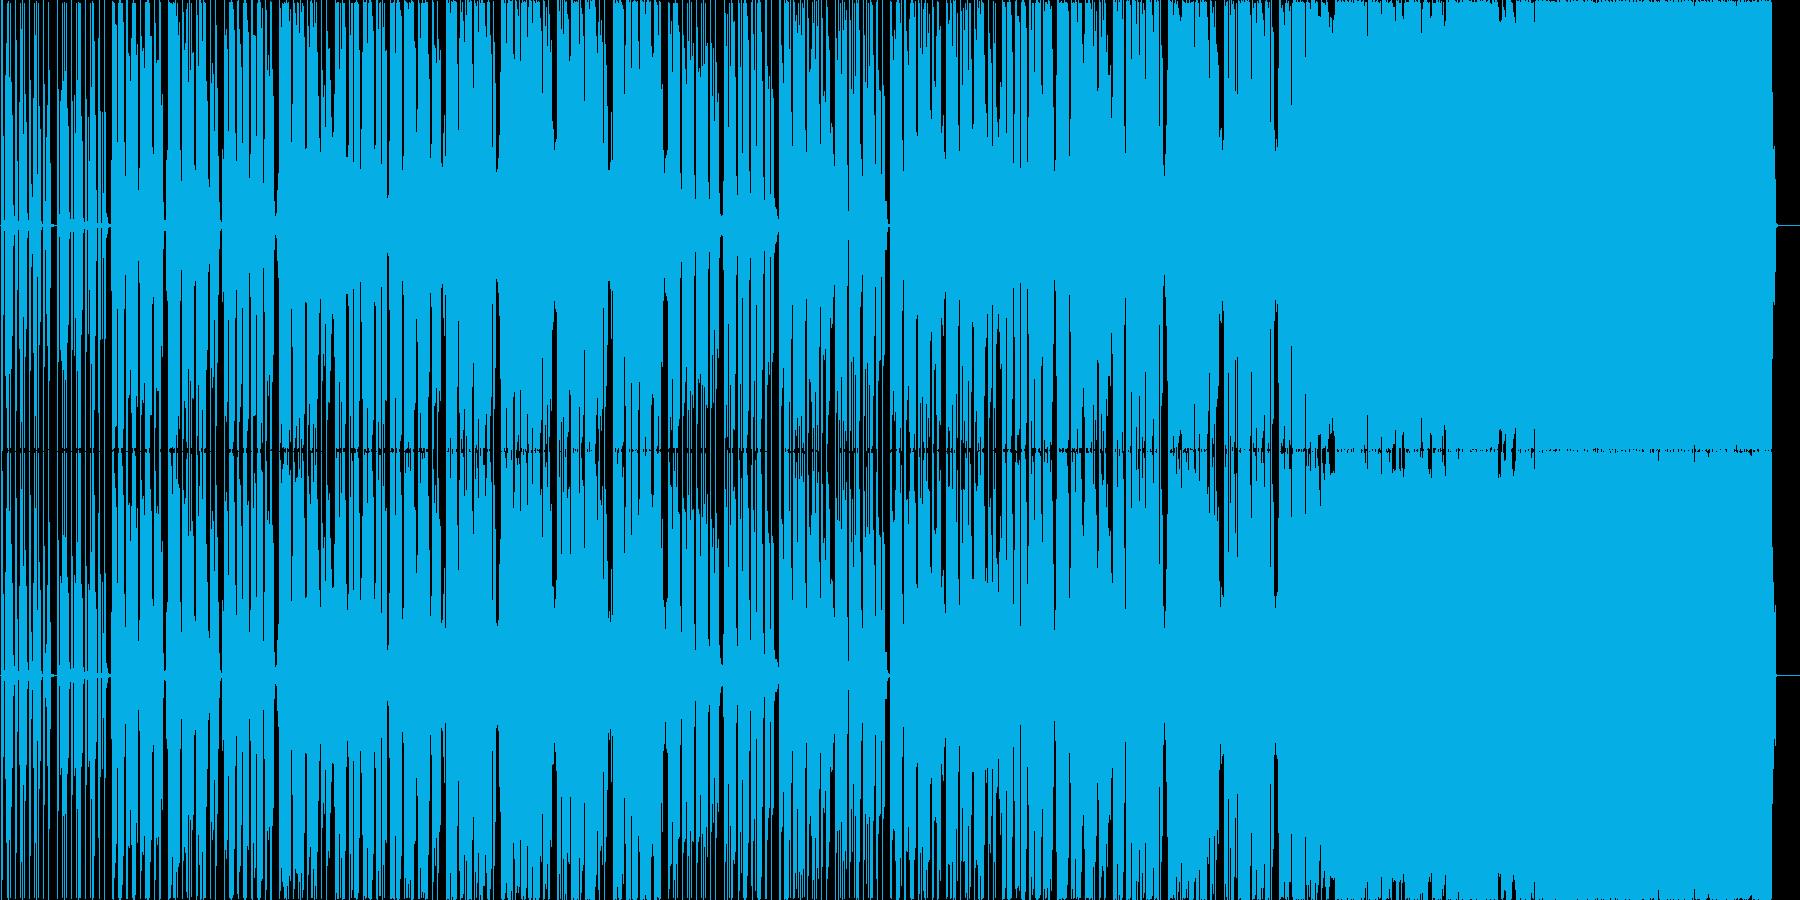 ISLAND (Feat. MATTON)の再生済みの波形